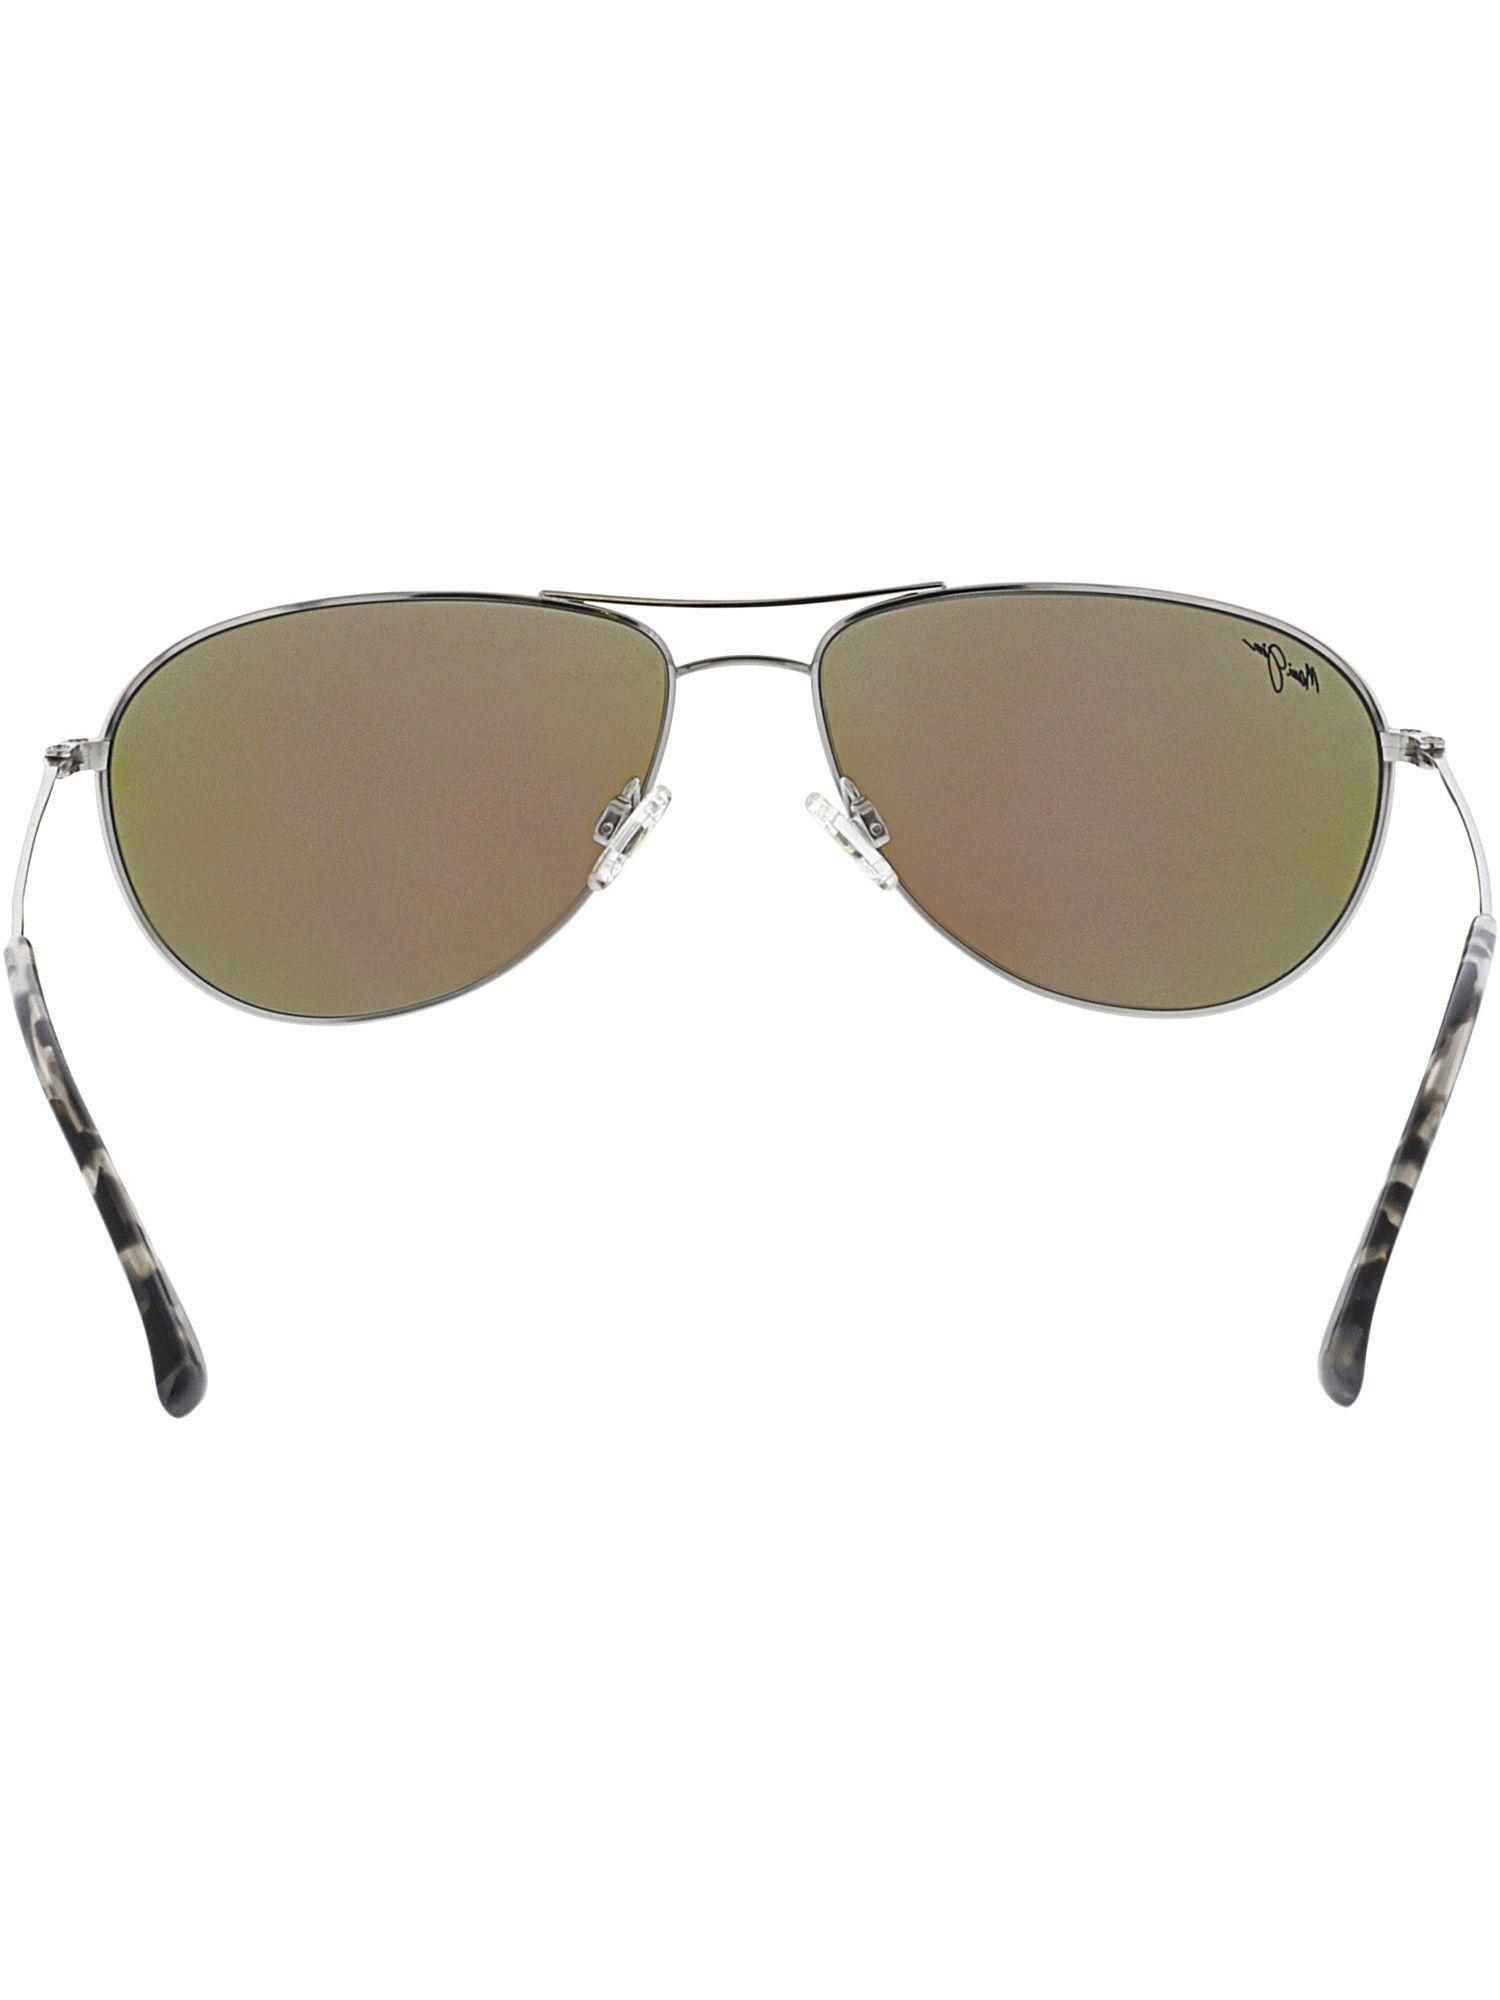 371233c0df263 Maui Jim - Metallic Women s Polarized Sea House B772-17 Silver Aviator  Sunglasses - Lyst. View fullscreen